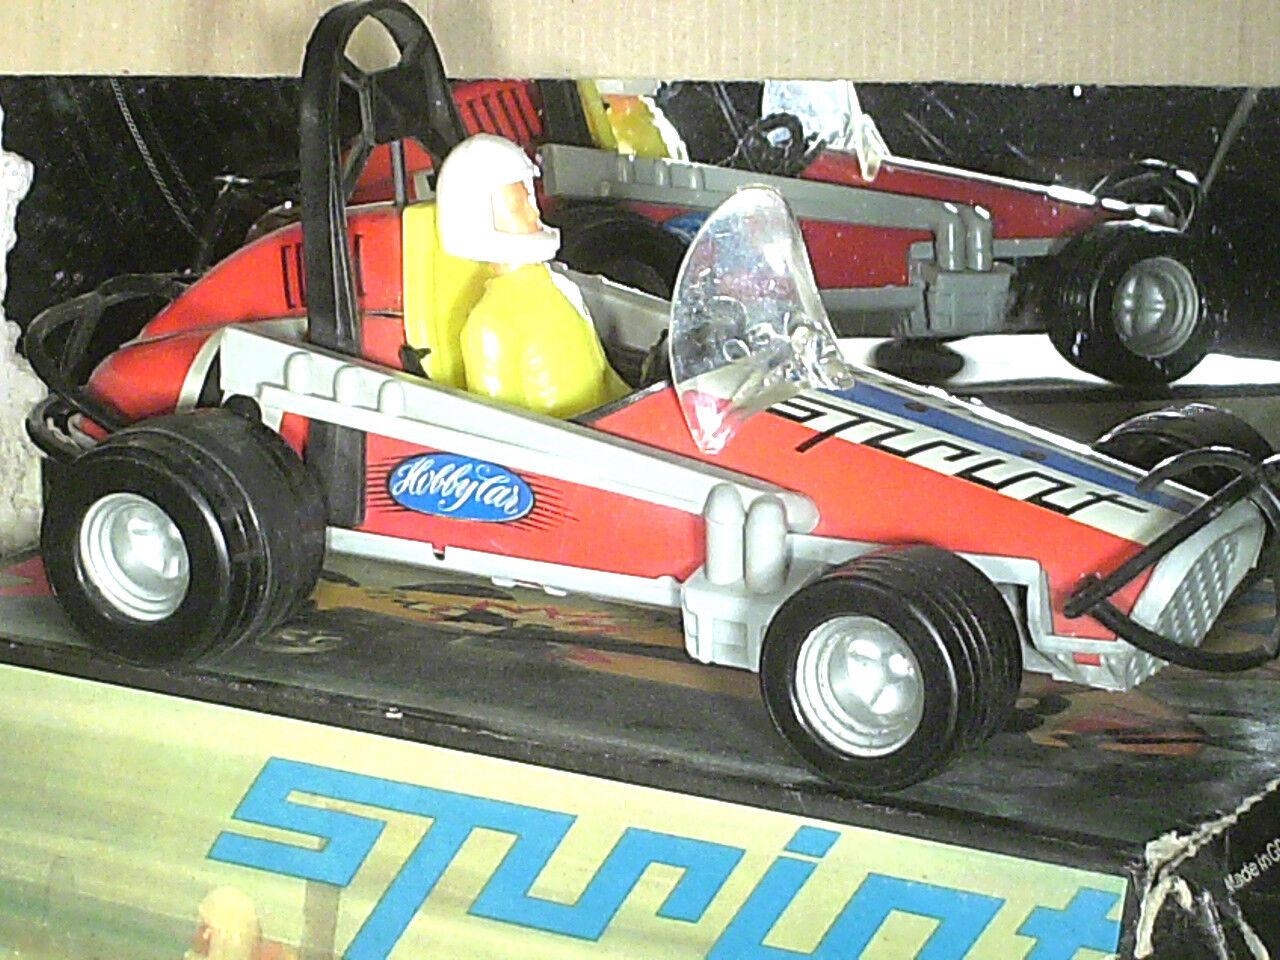 AUTO NASCAR DIRTCHAMP SPRINTS SPRINTS SPRINTS USA  BEAU JOUET TOLE 27cm MSB 1970 MADE IN  GDR 2c2600